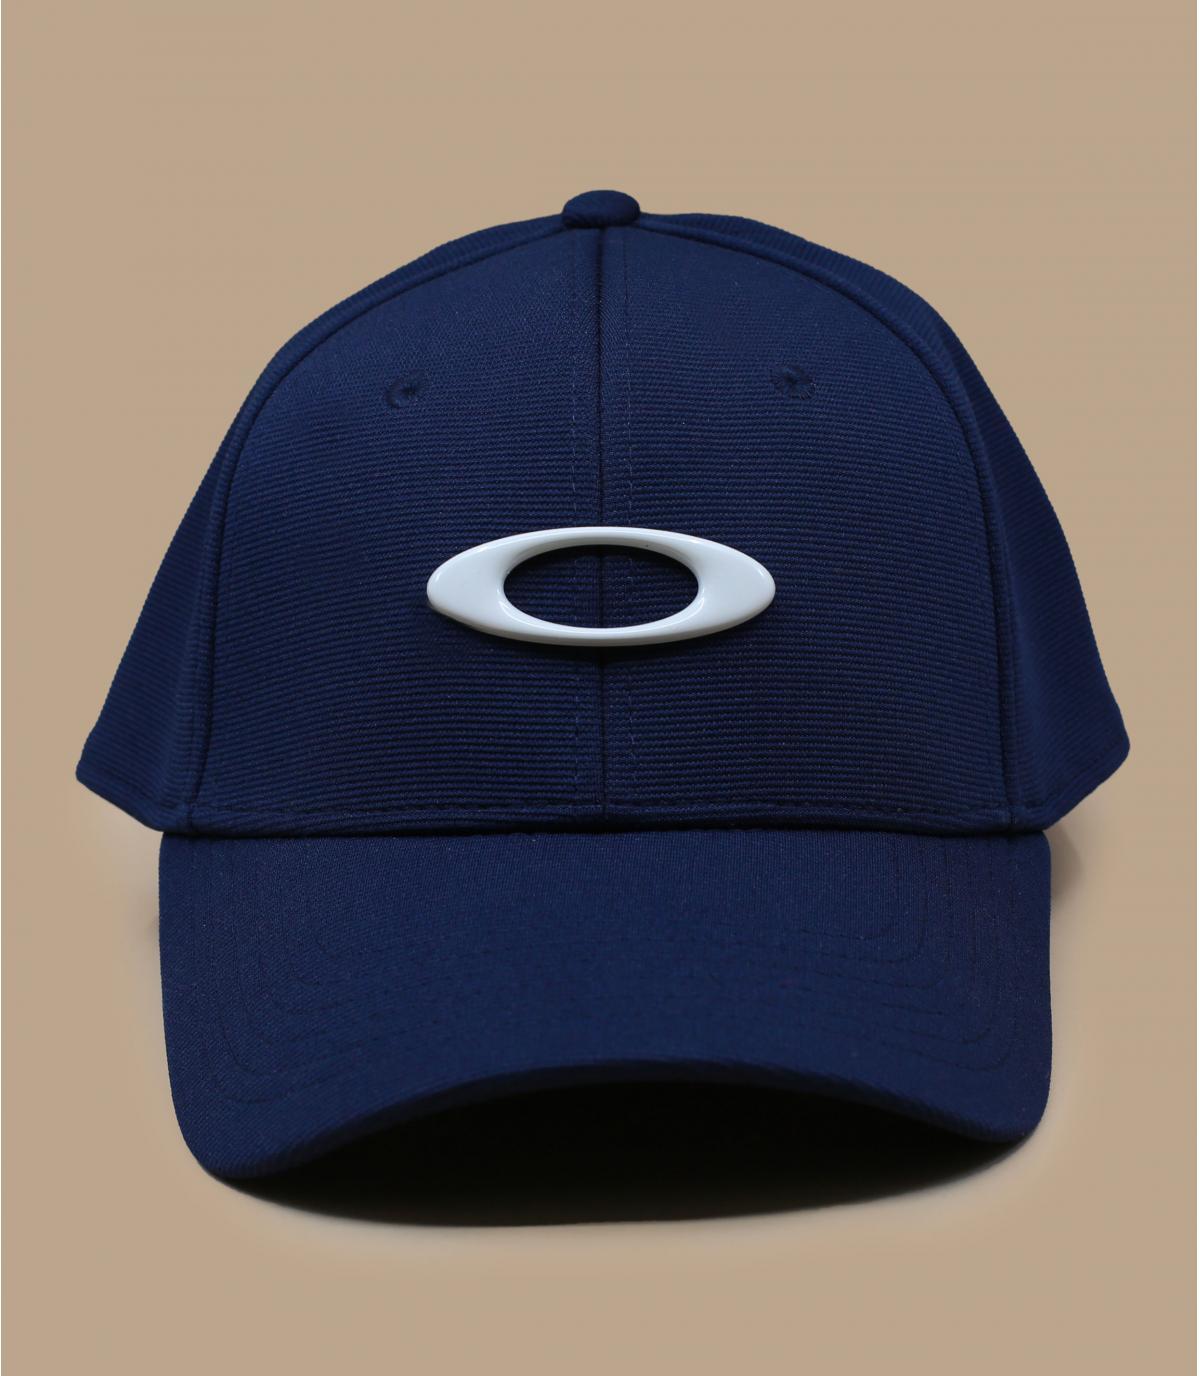 casquette Oakley bleu marine